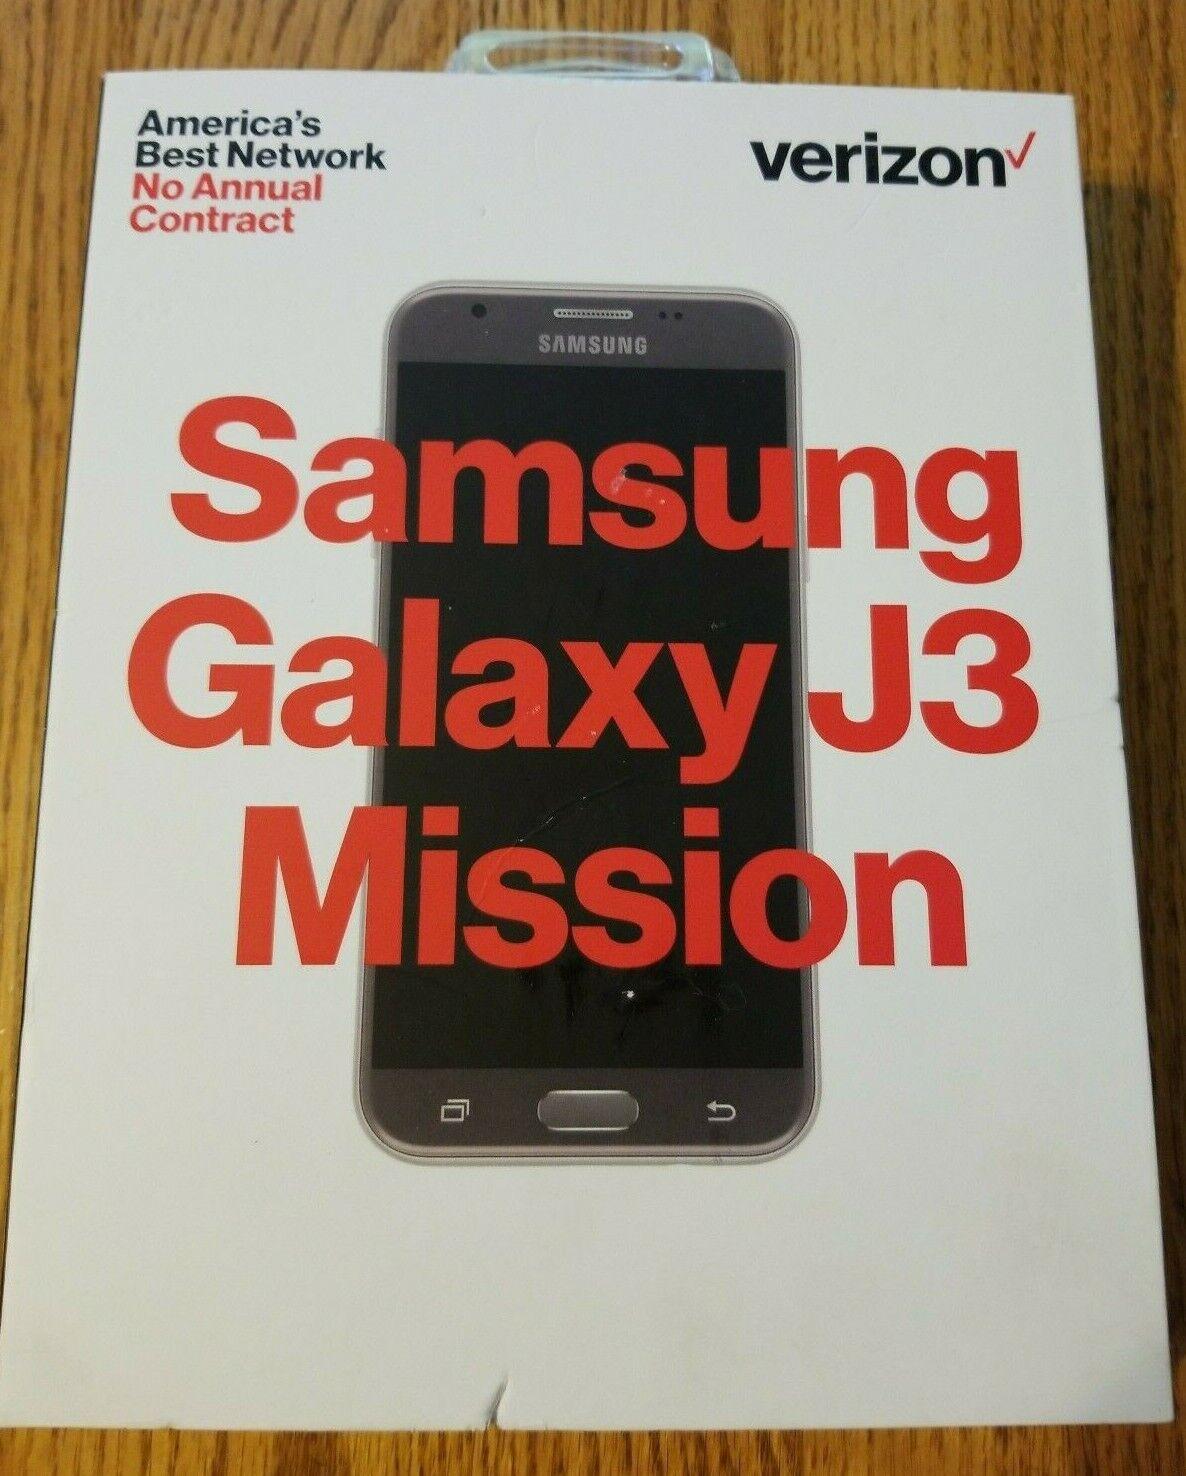 "Samsung SM-J327 Galaxy J3 Mission 5"" Prepaid Carrier Locked"